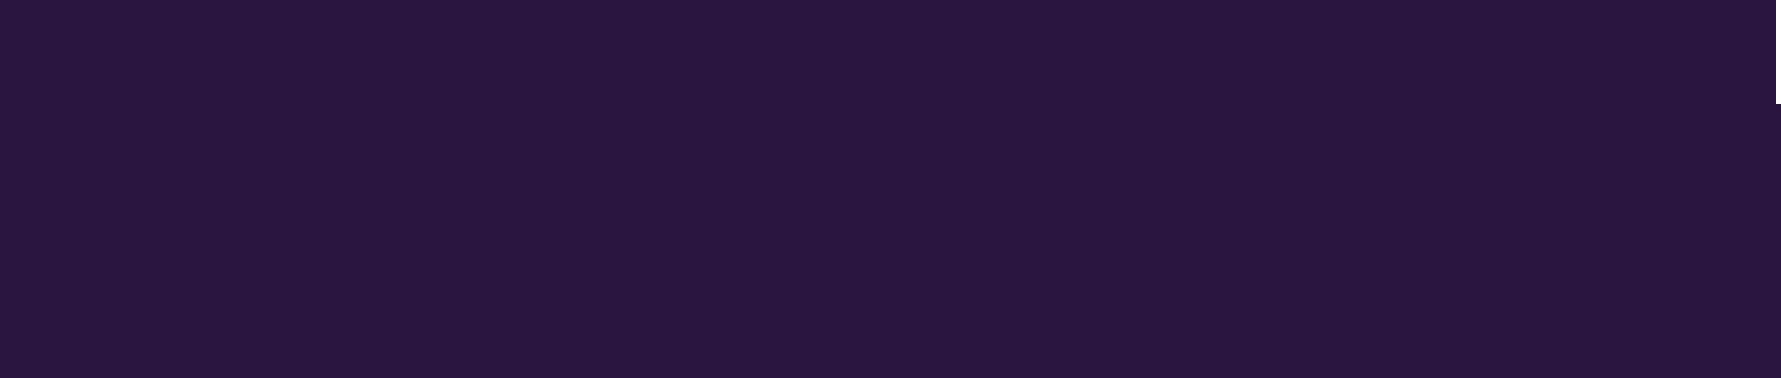 mentorluk_logo